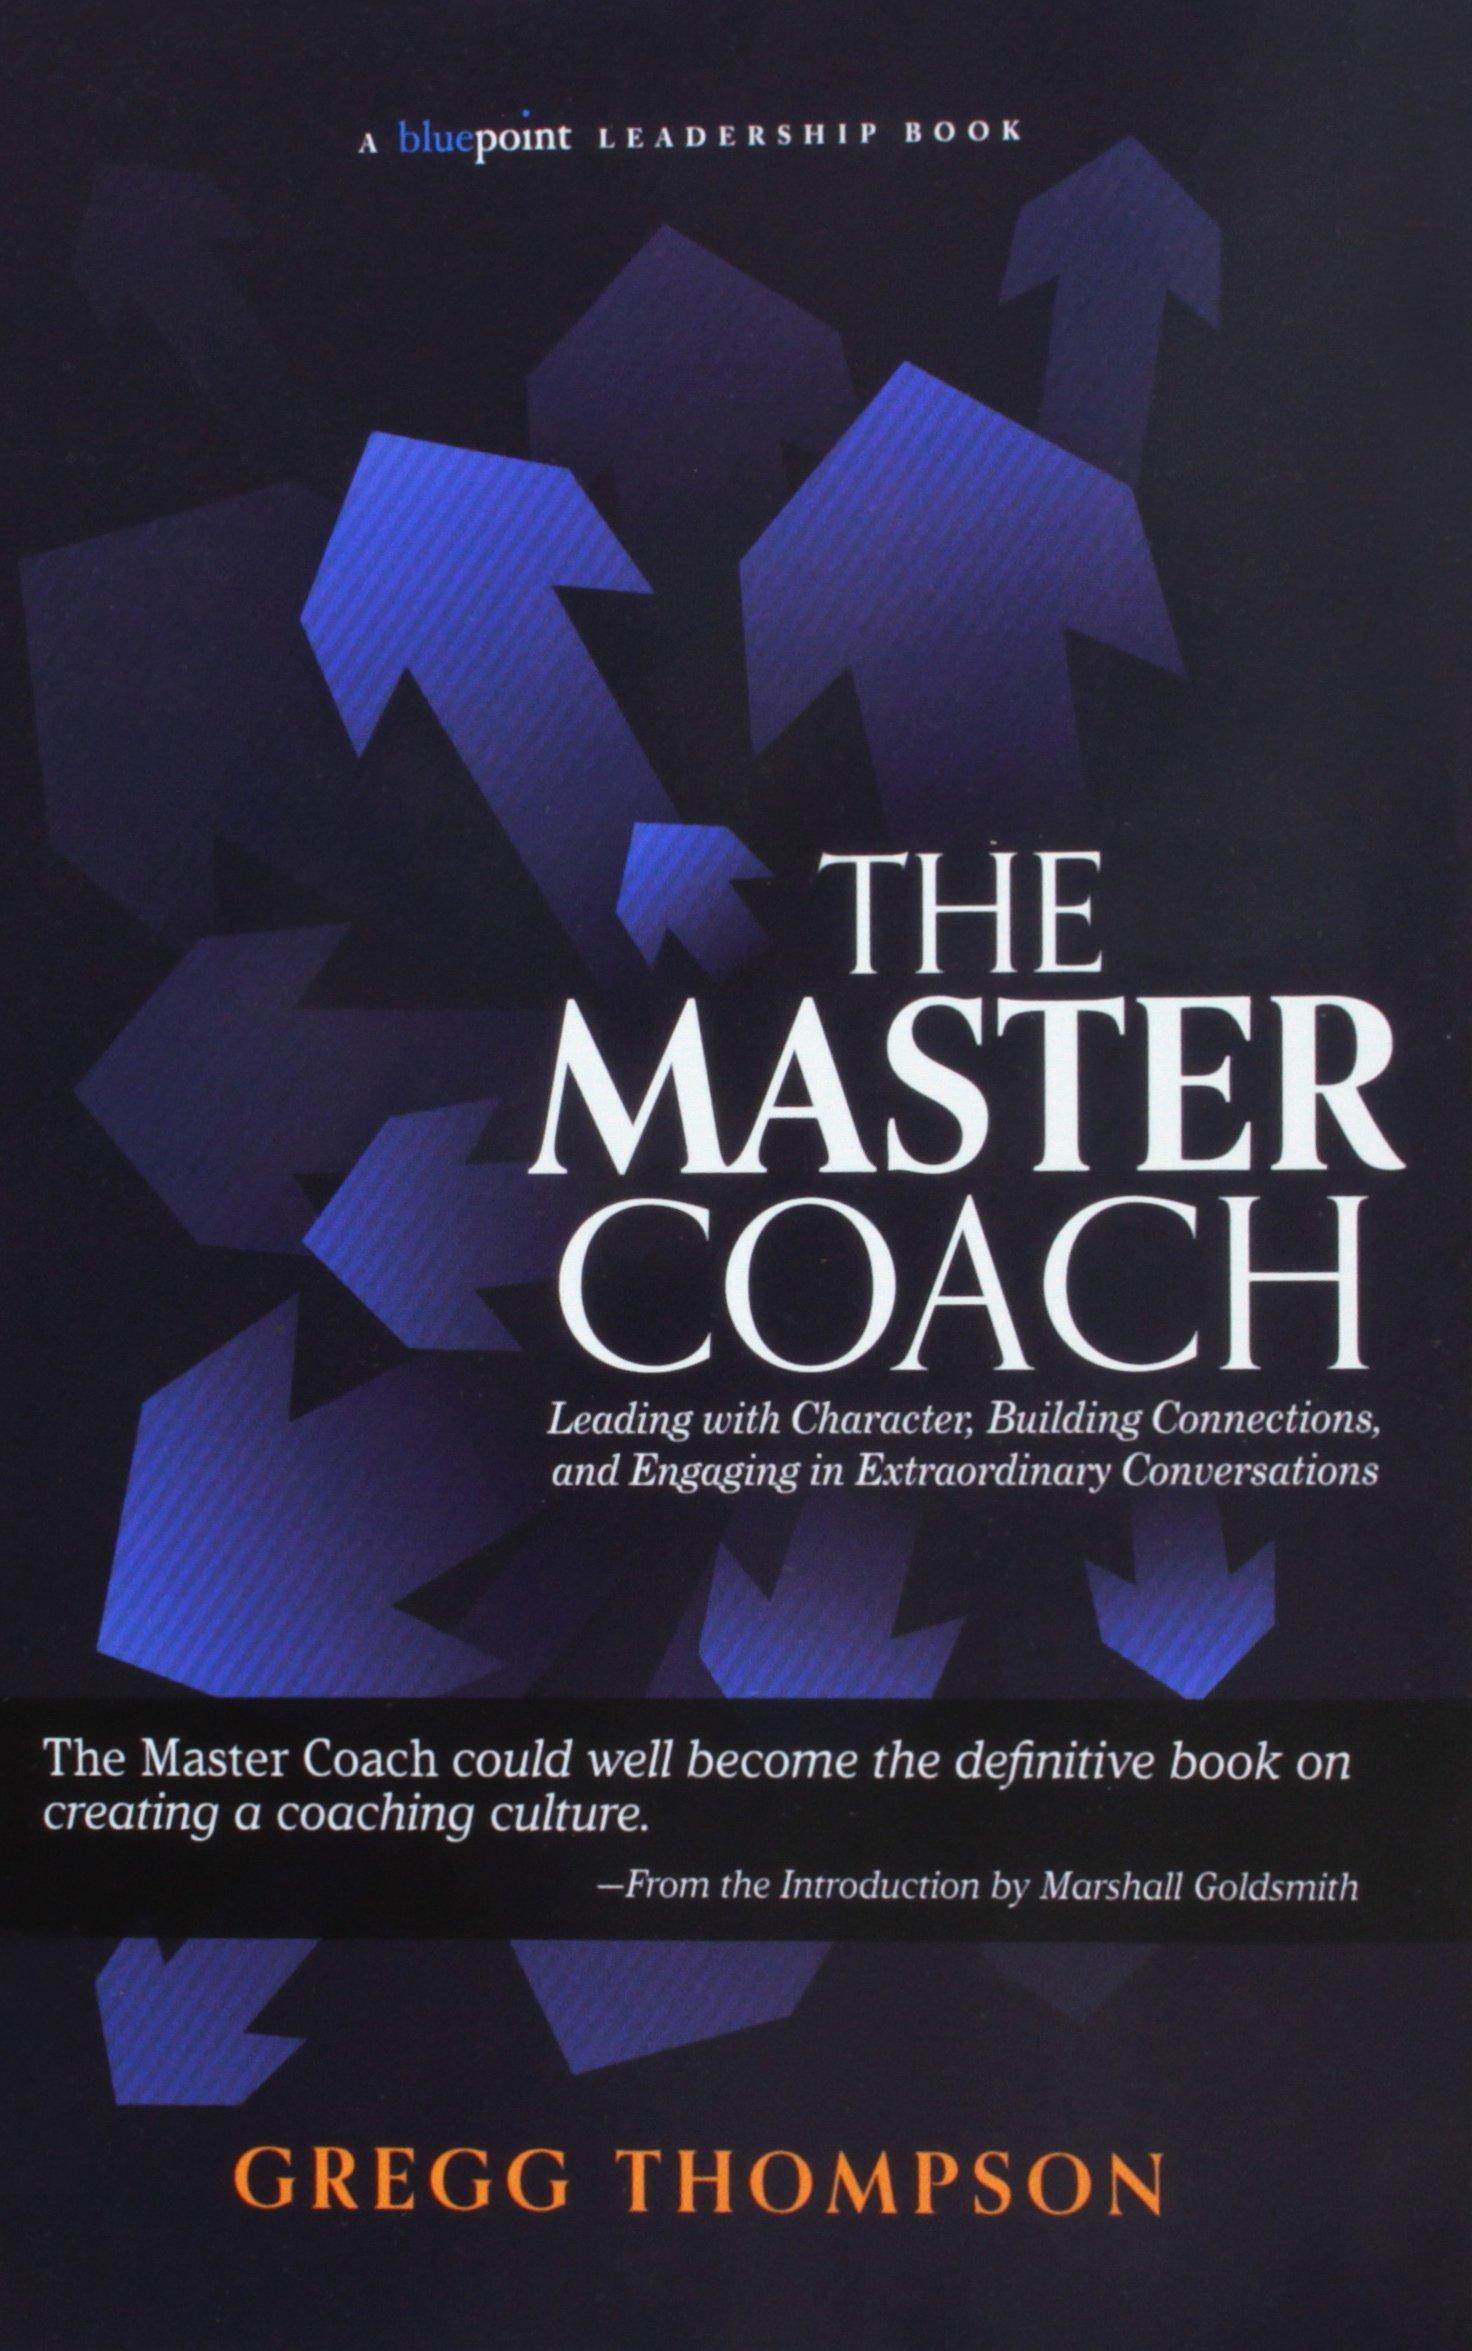 Gregg Thompson The Master Coach (Book).jpg